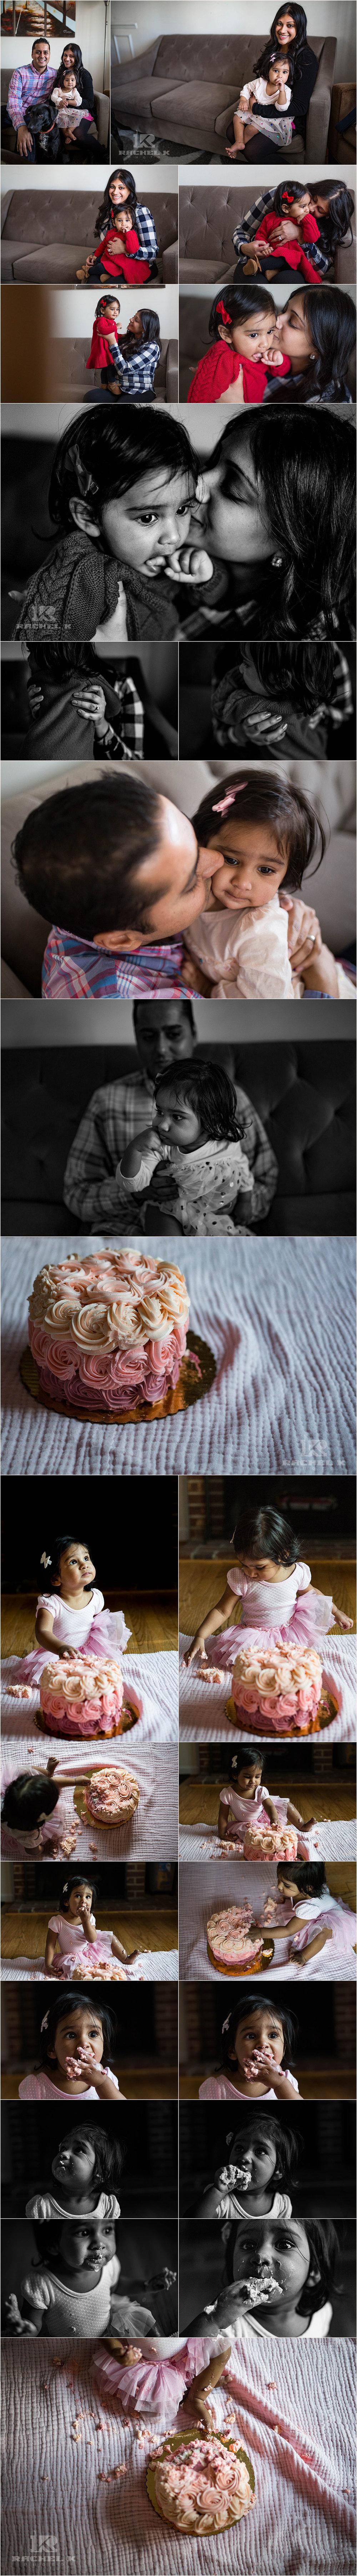 Arlington VA cake smash session by Rachel K Photo